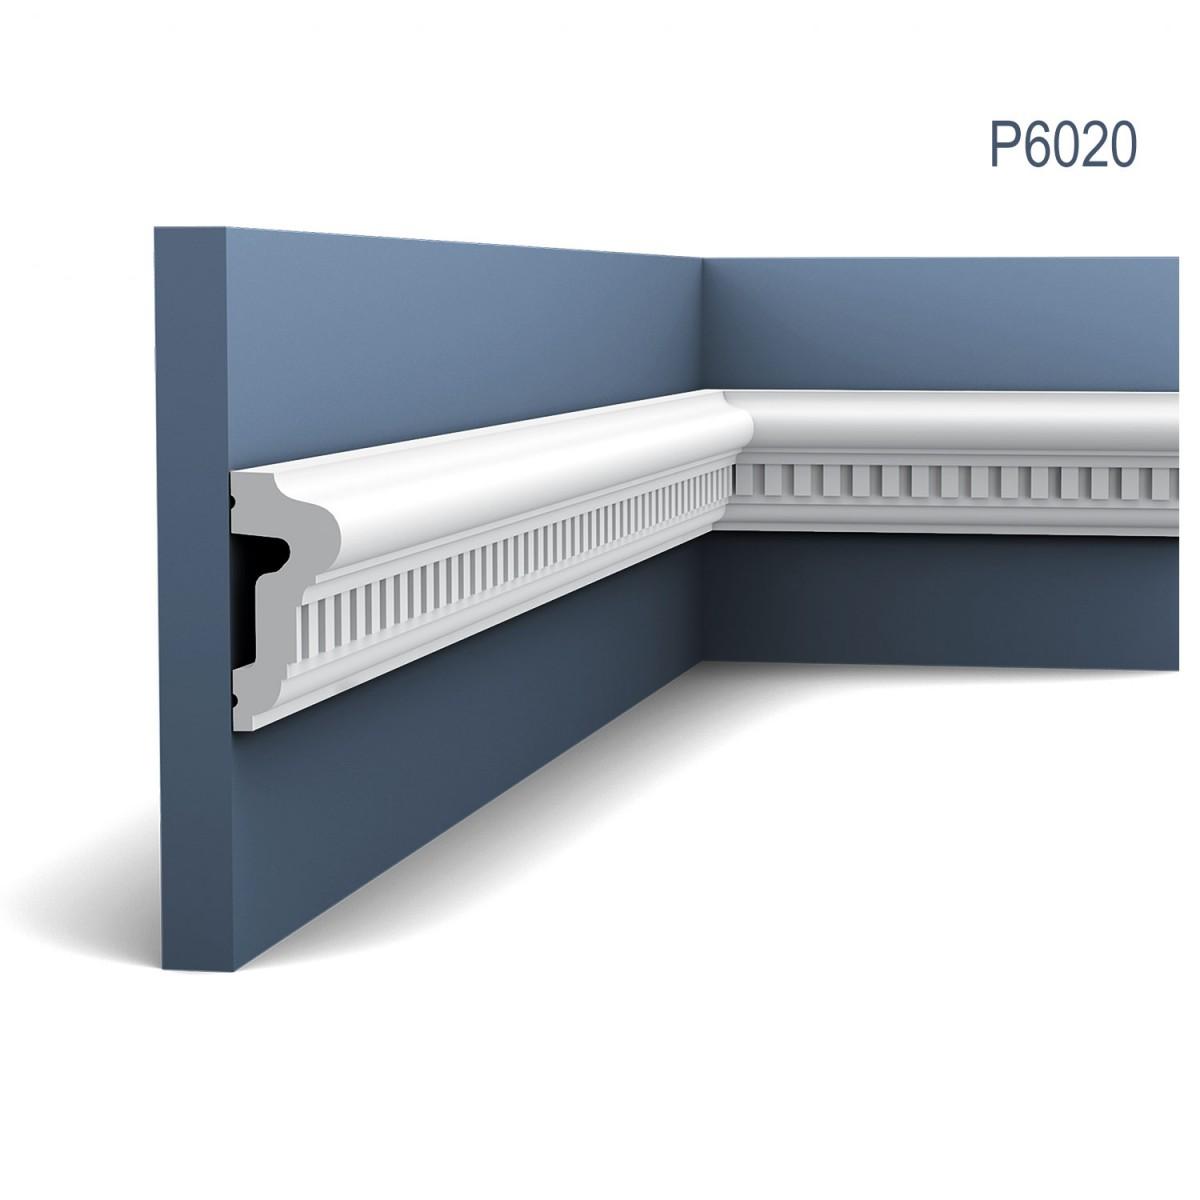 Brau Luxxus P6020, Dimensiuni: 200 X 6.4 X 2.8 cm, Orac Decor